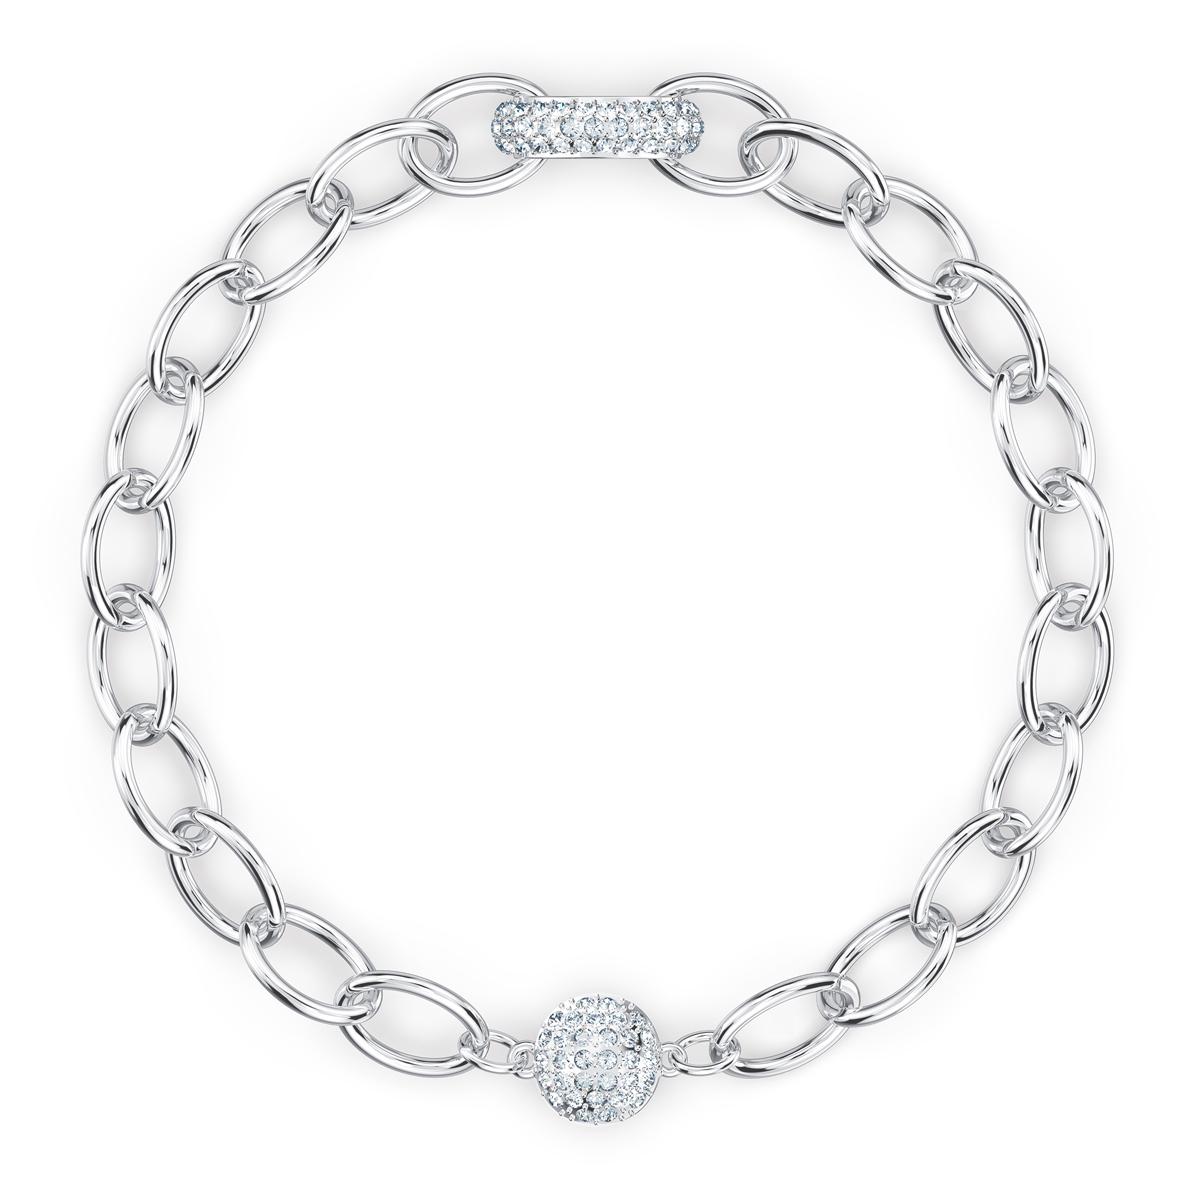 Swarovski The Elements Chain Bracelet, White, Rhodium Plated